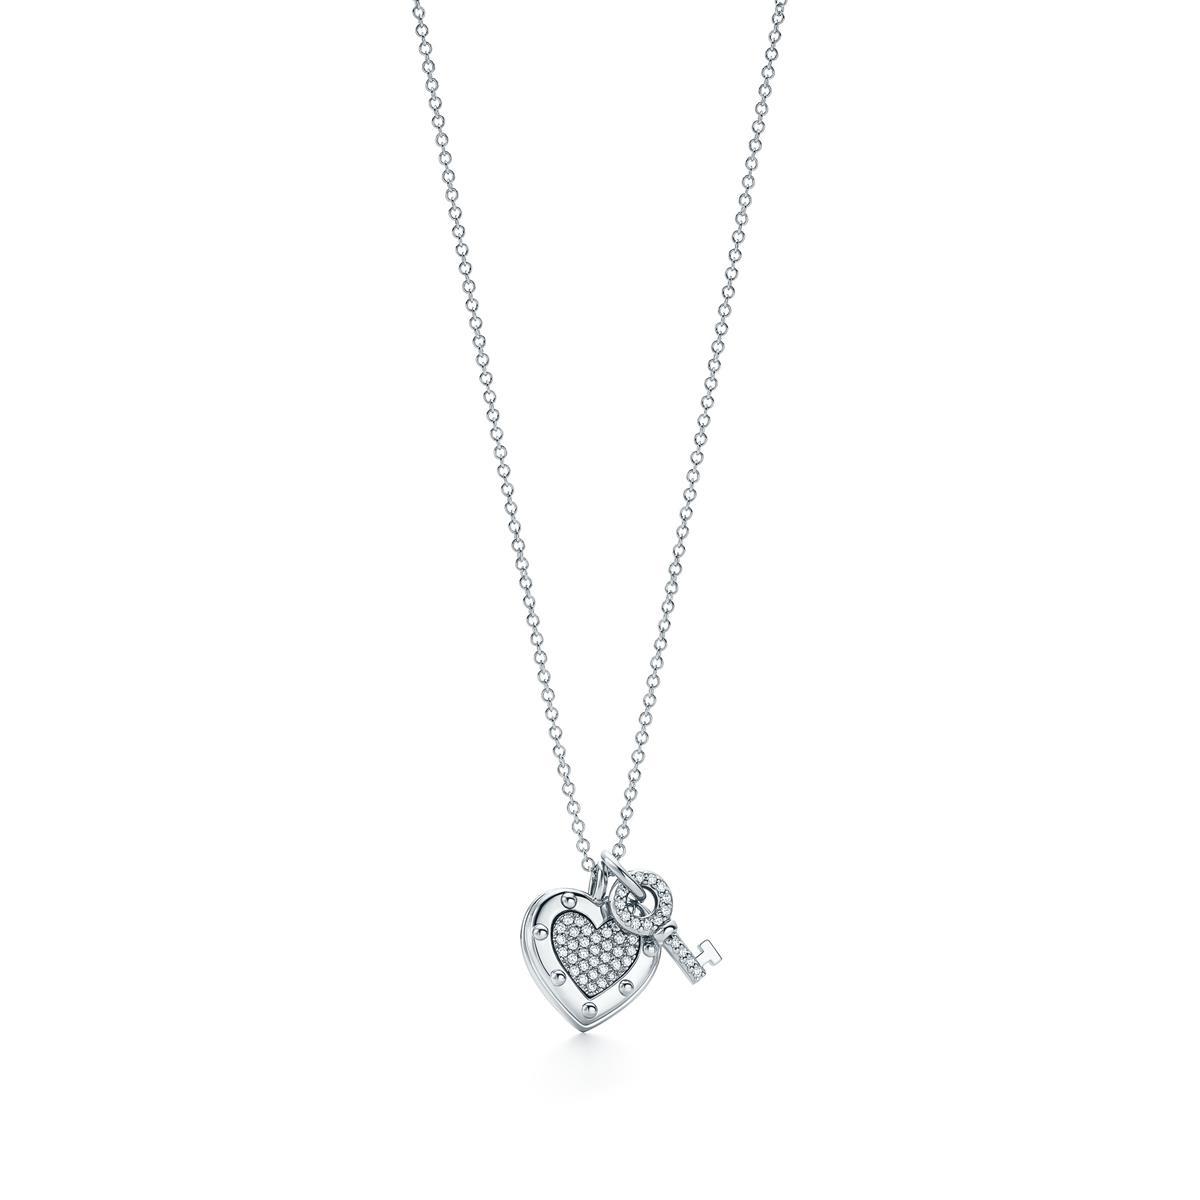 06_Tiffany RTT Love 36339322_pendant (Copy)